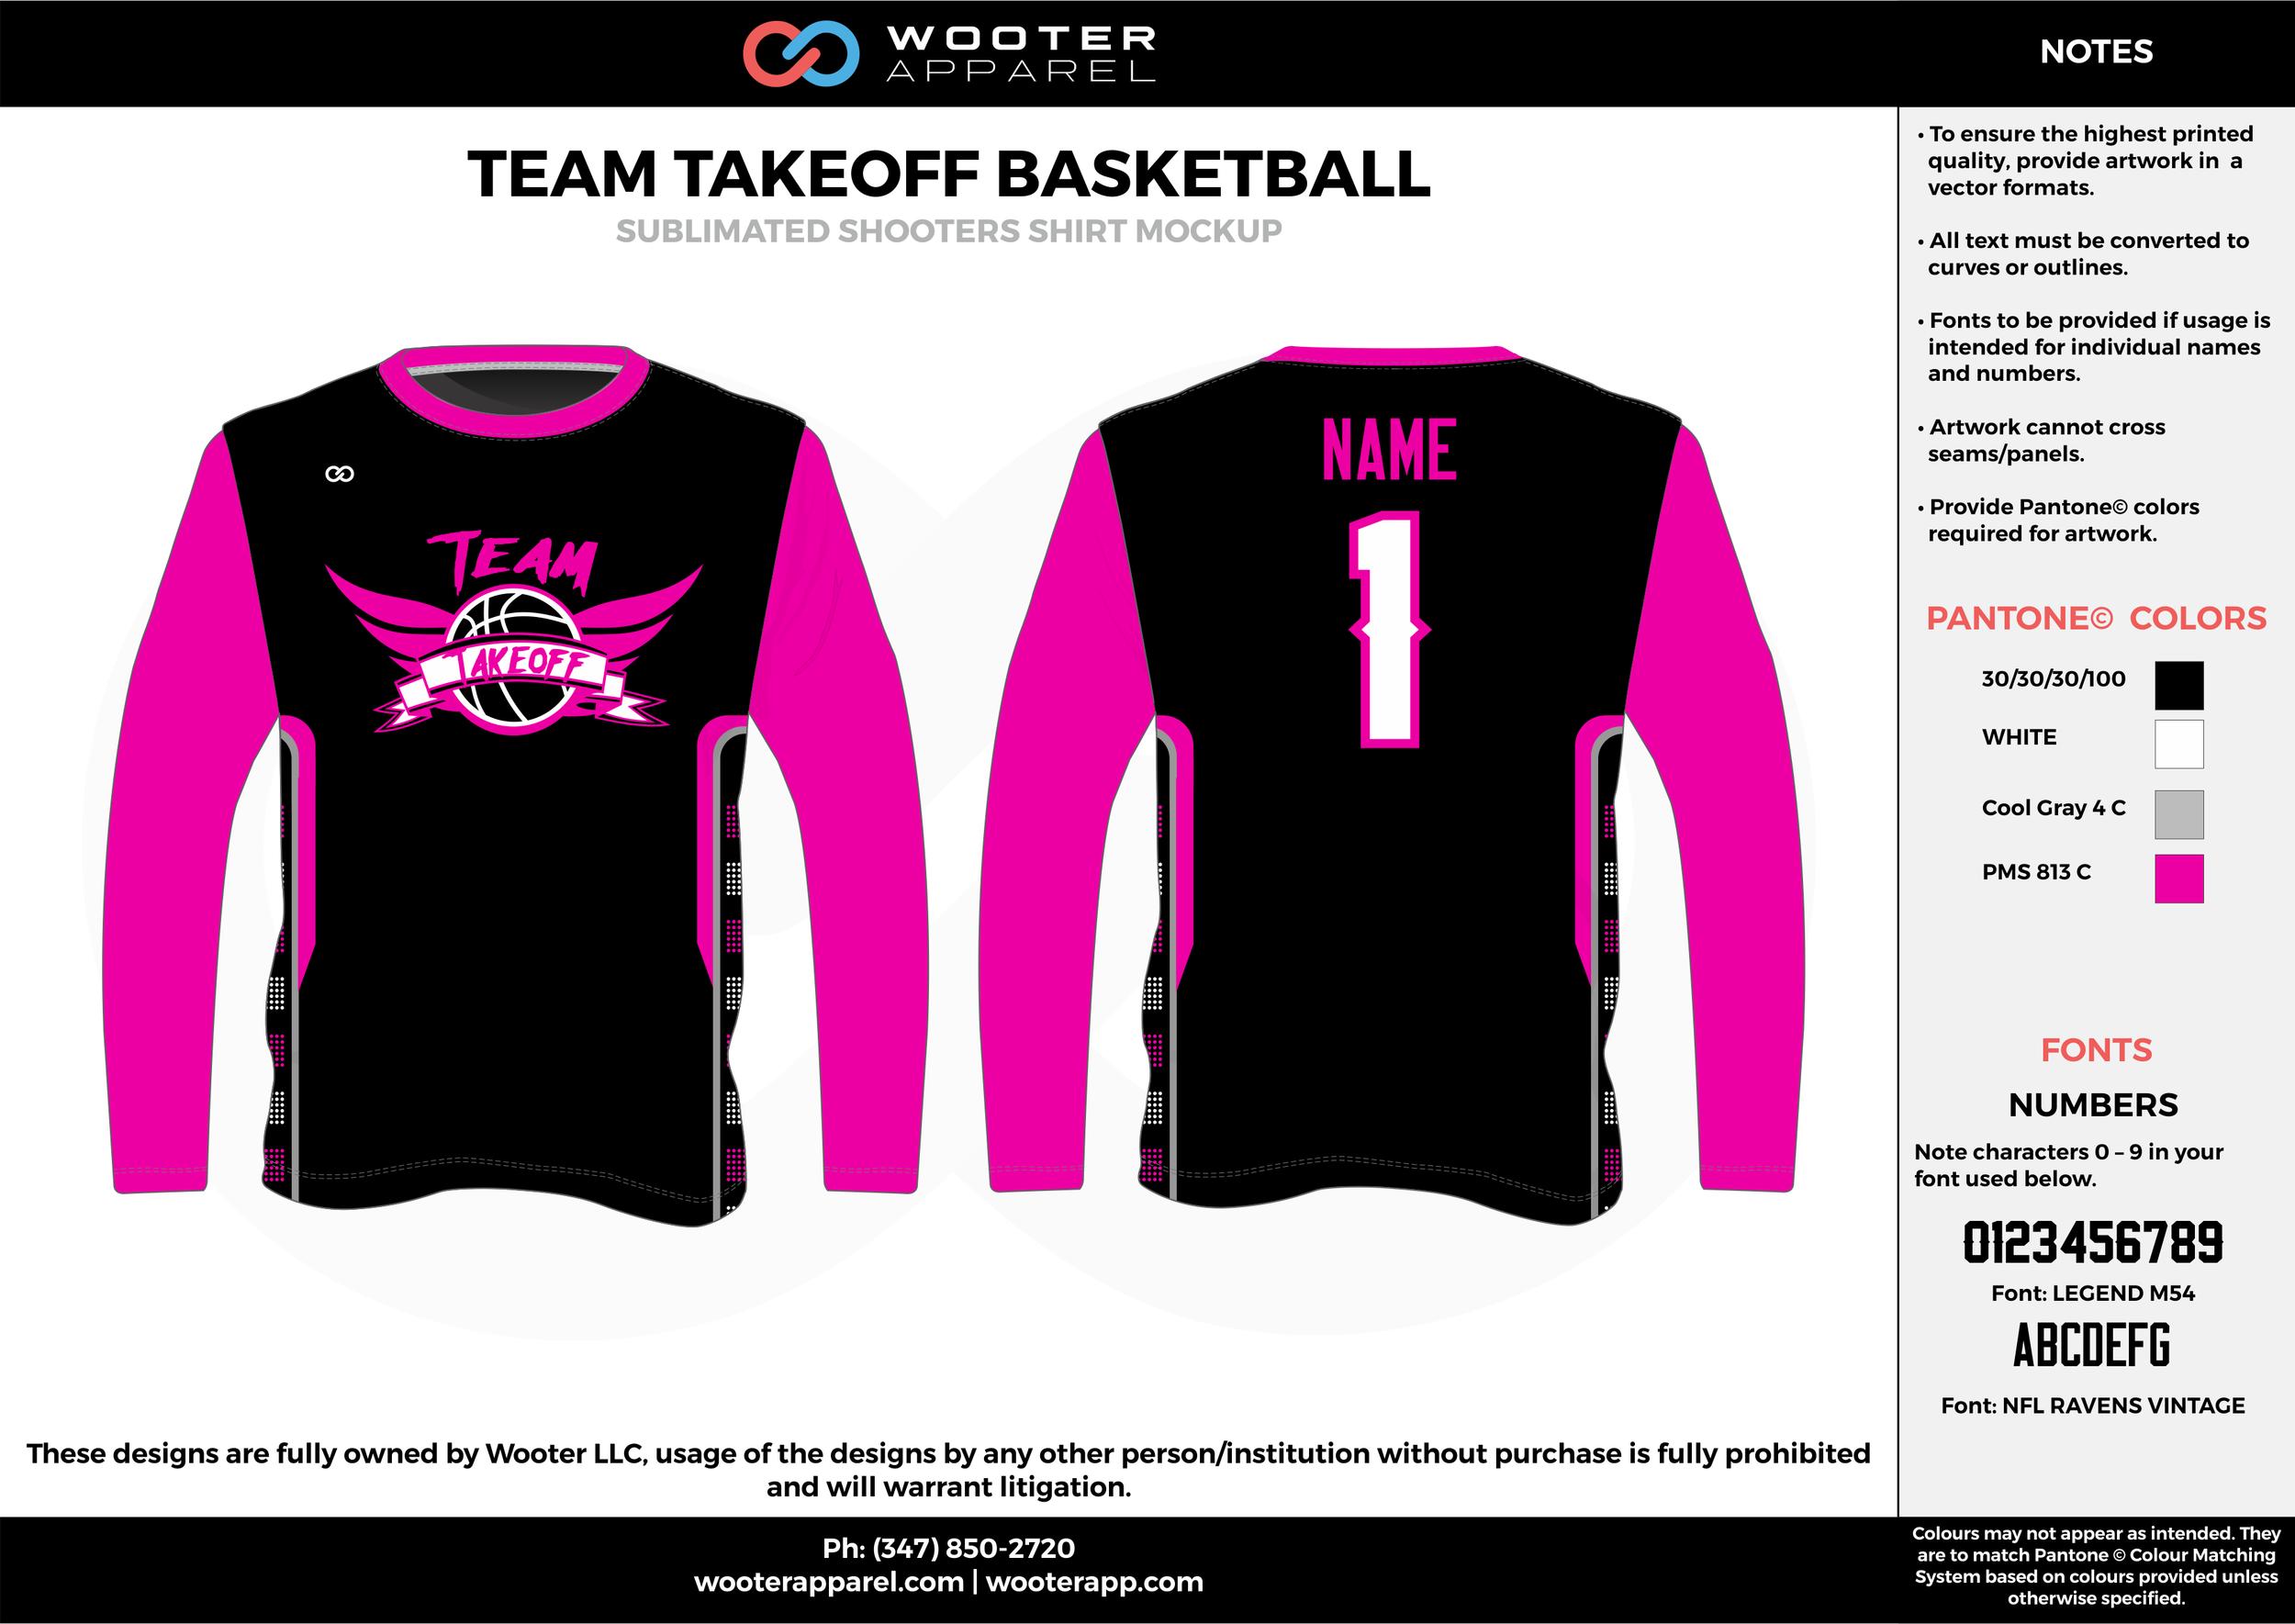 TEAM TAKEOFF BASKETBALL pink black white custom design t-shirts